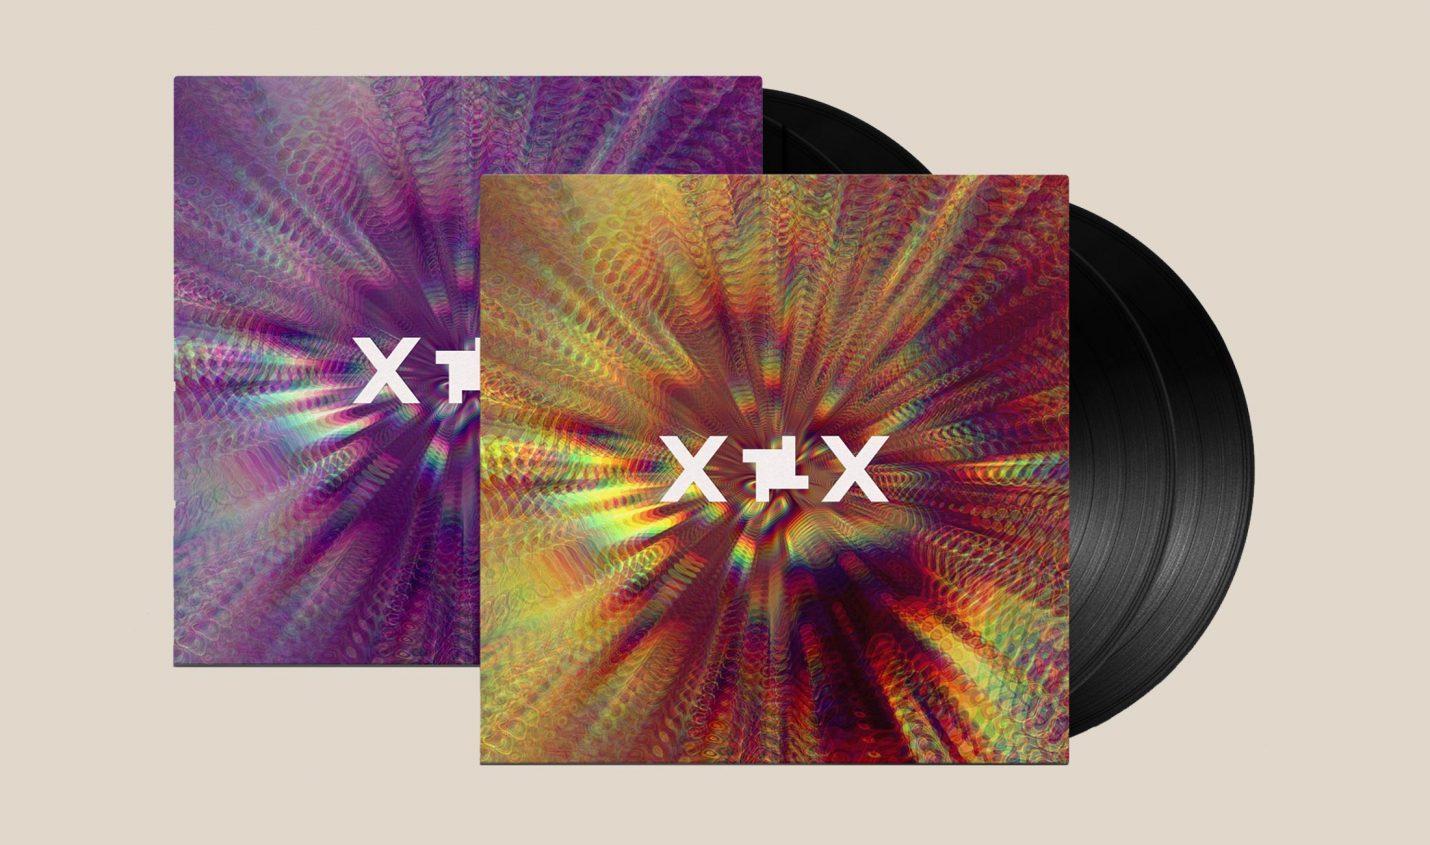 20 Jahre Fabric-Club: Compilation als Doppel-Vinyl angekündigt